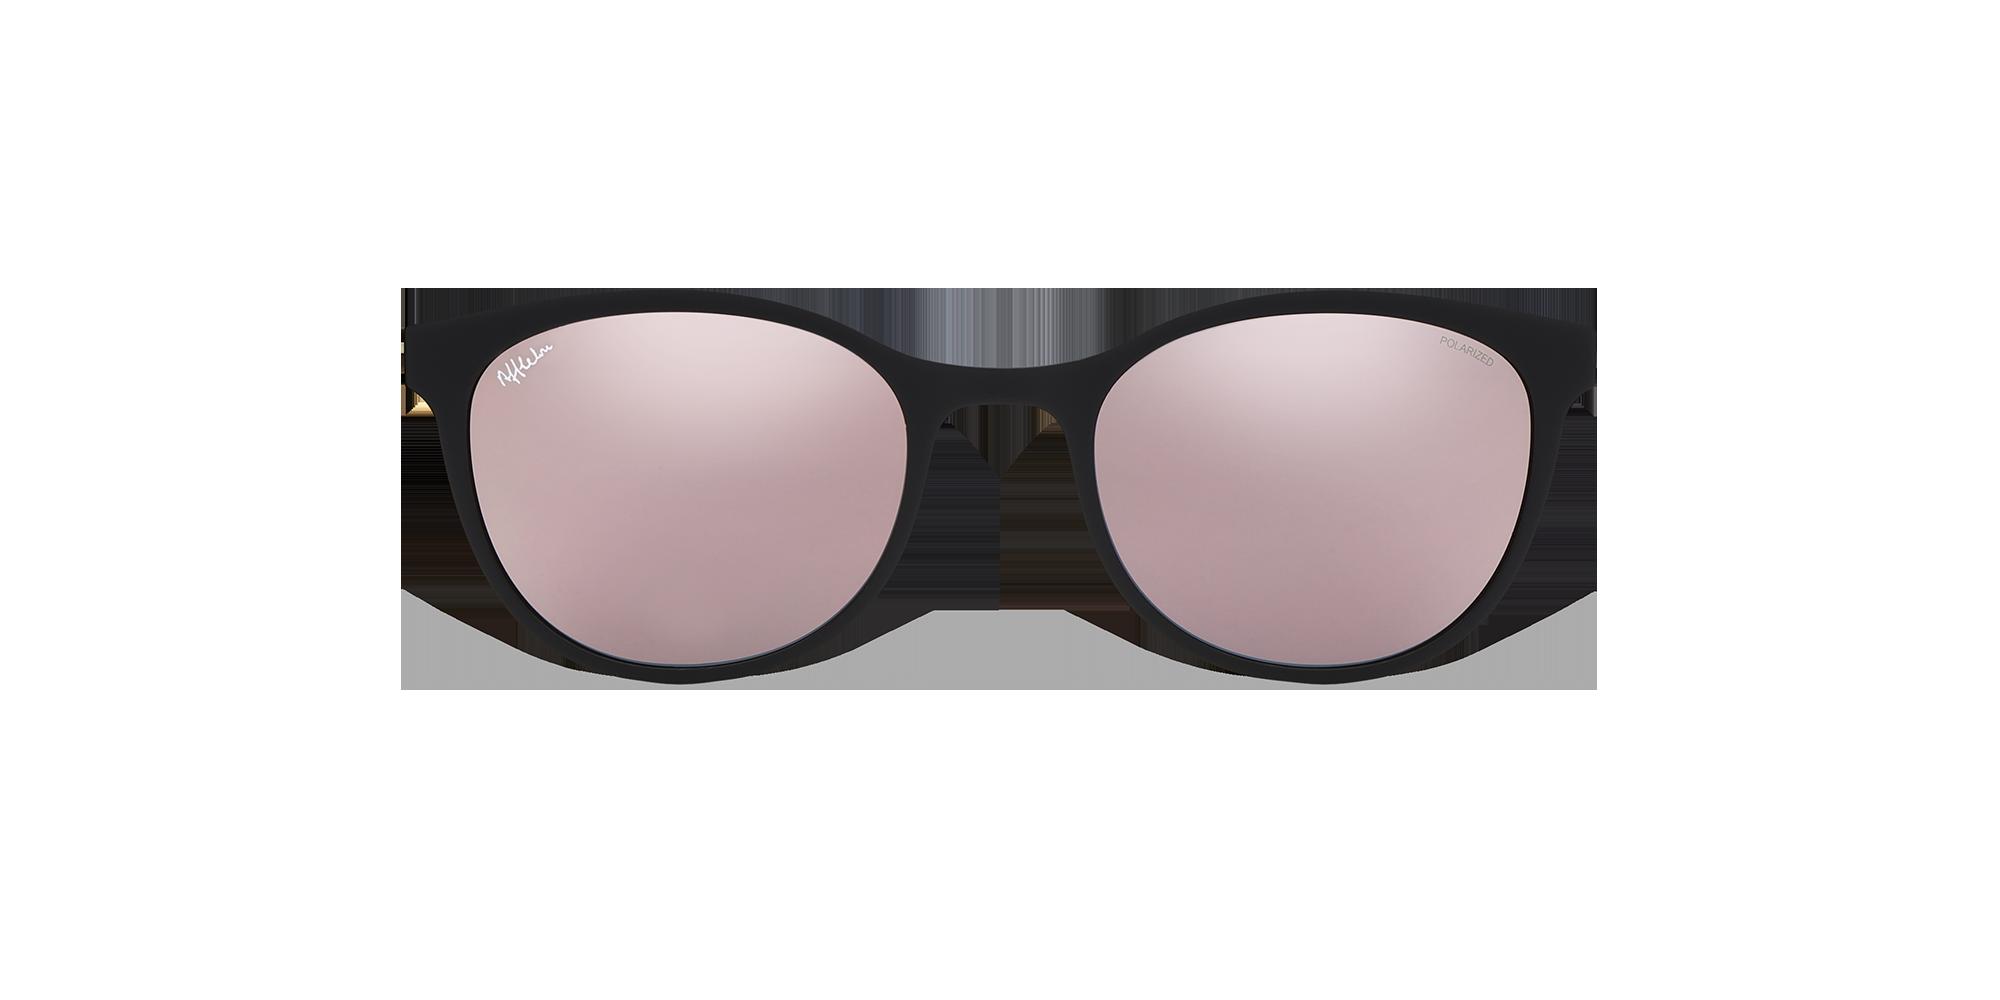 afflelou/france/products/smart_clip/clips_glasses/TMK45PRBK014818.png